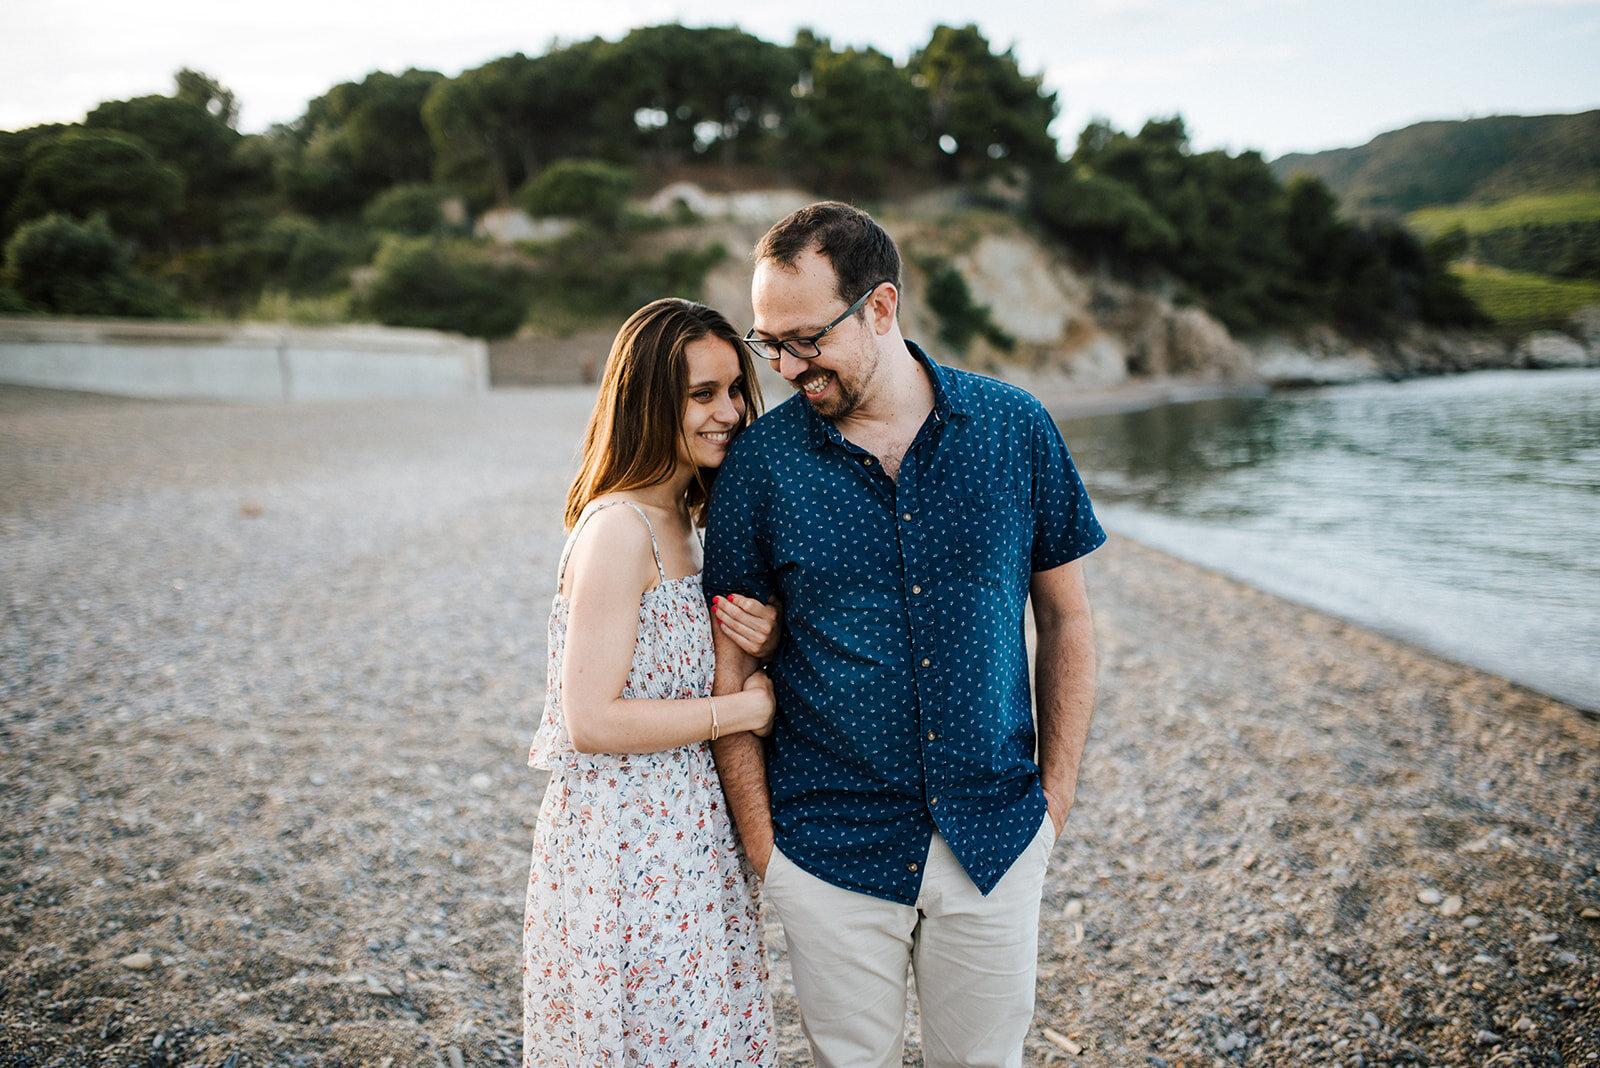 Photographe Mariage et couple Perpignan36.jpg